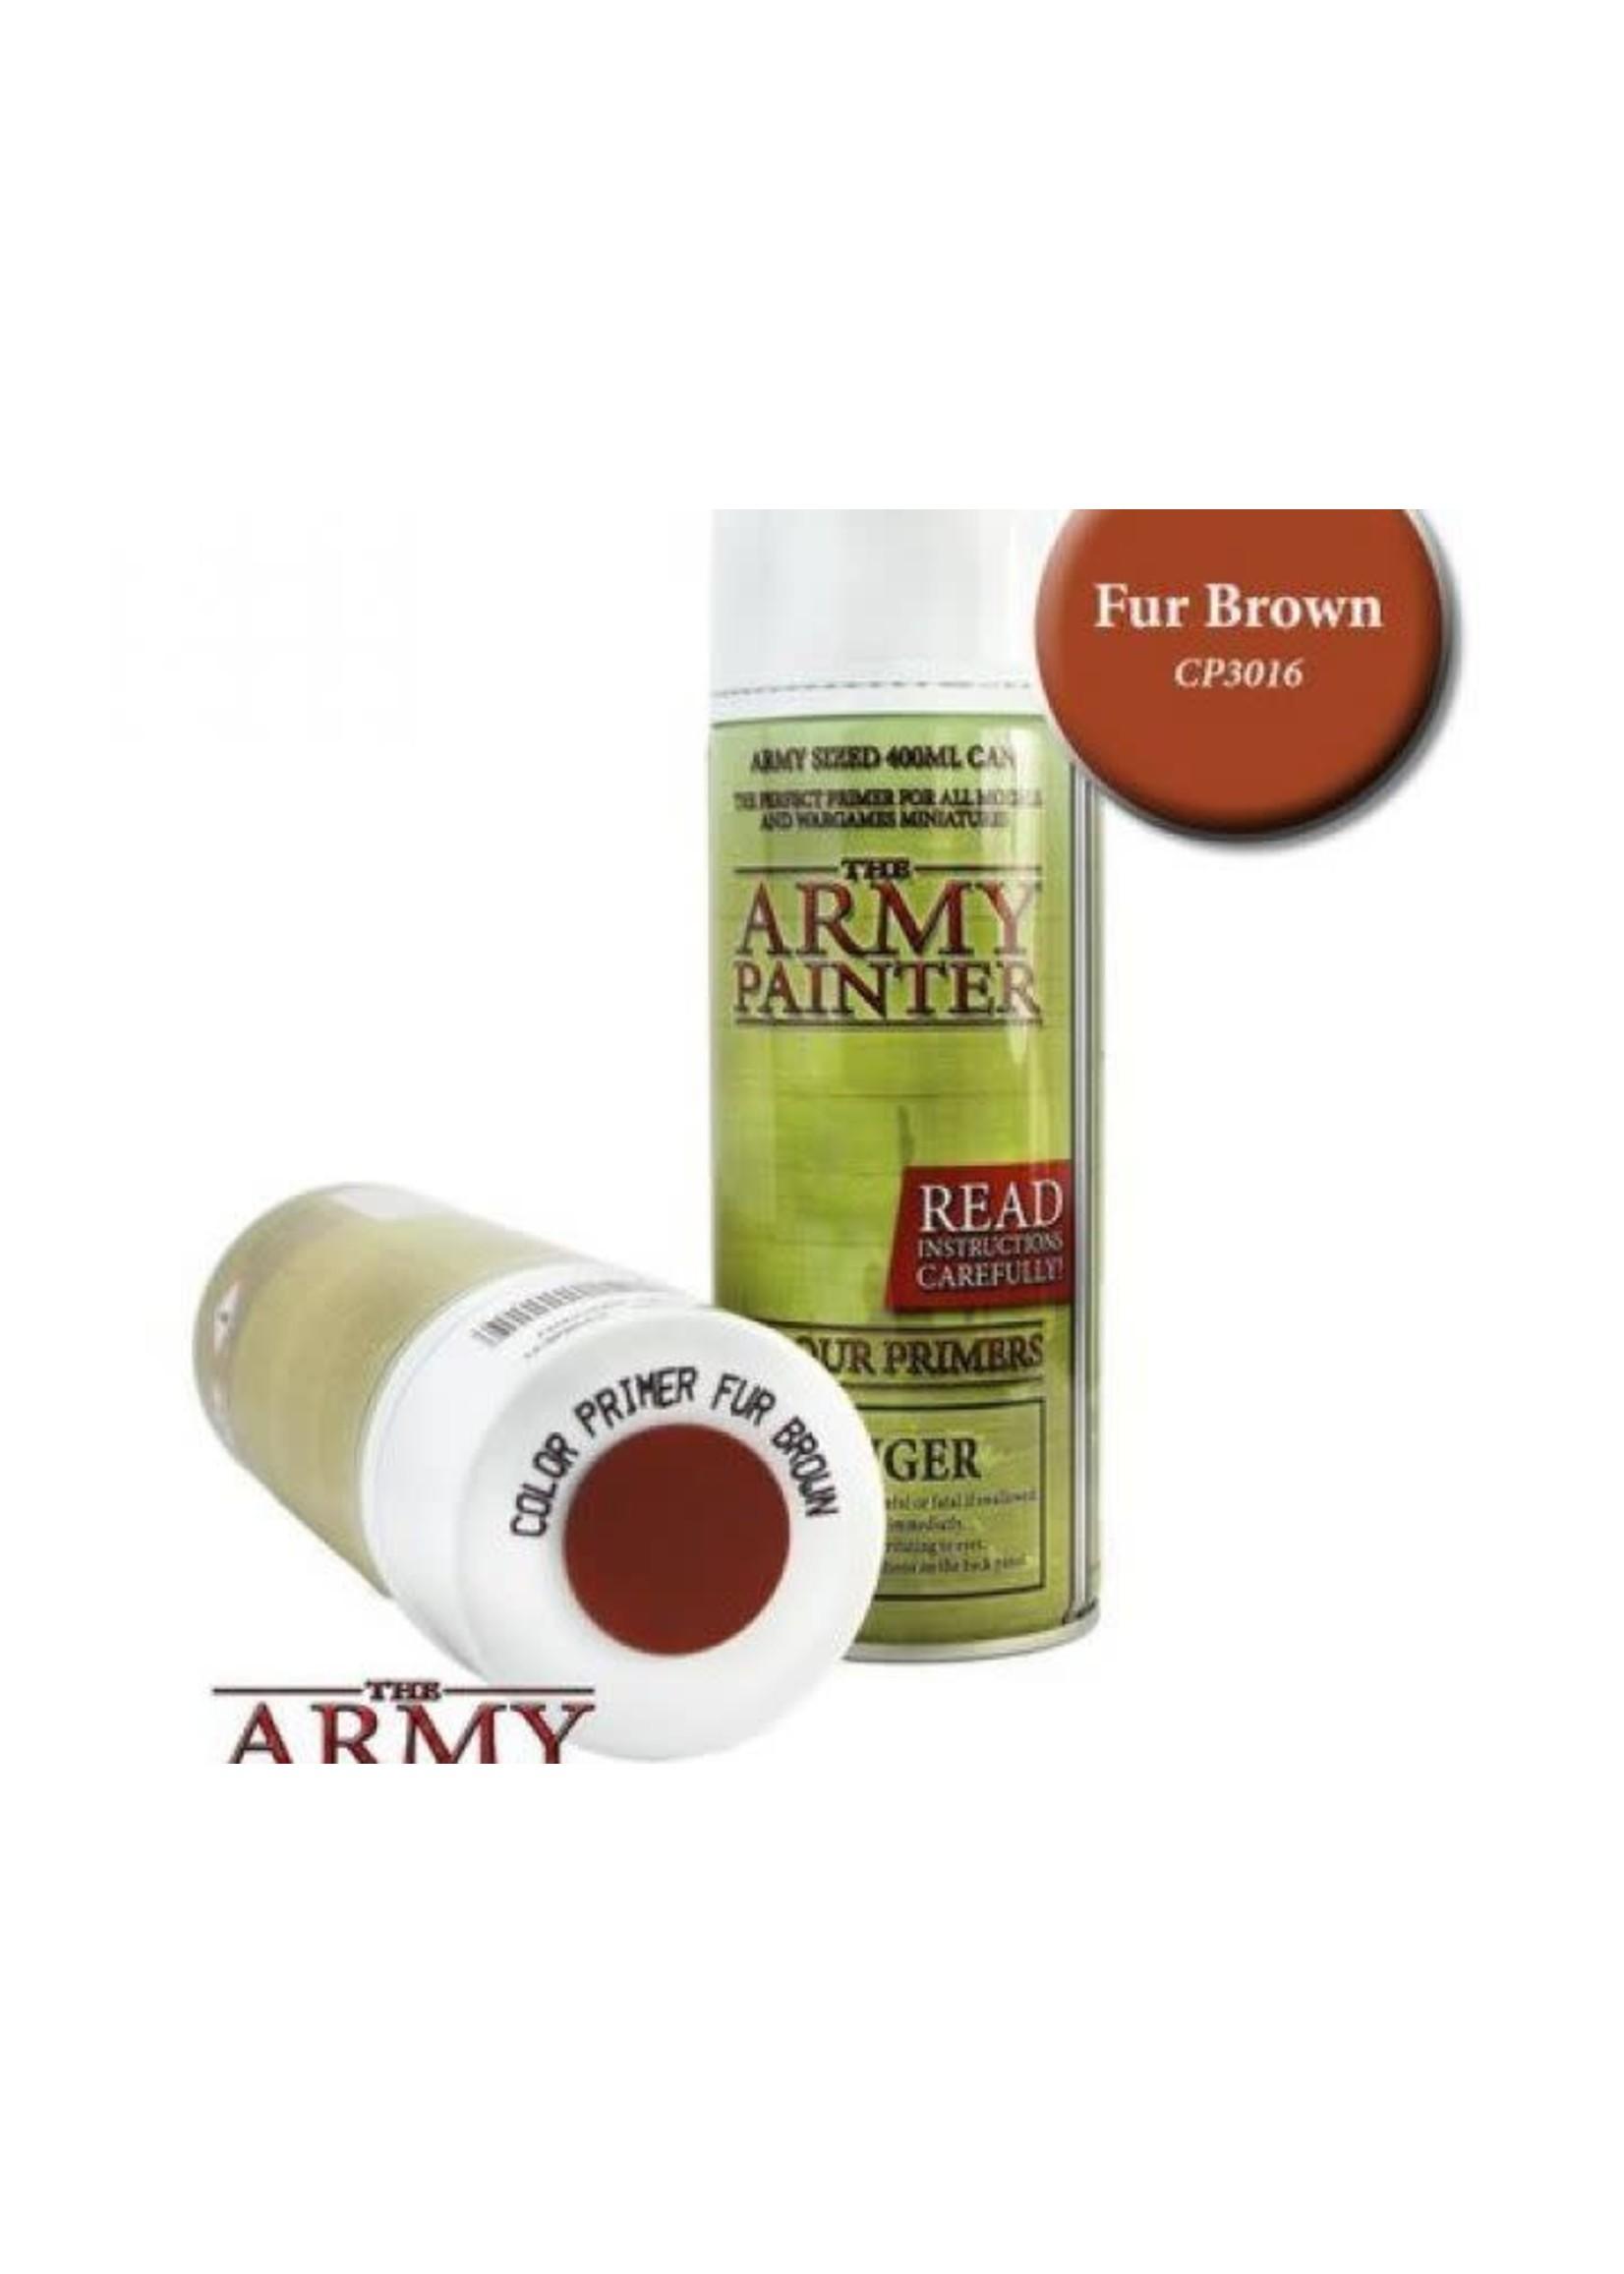 Army Painter Colour Primer - Fur Brown (400Ml)